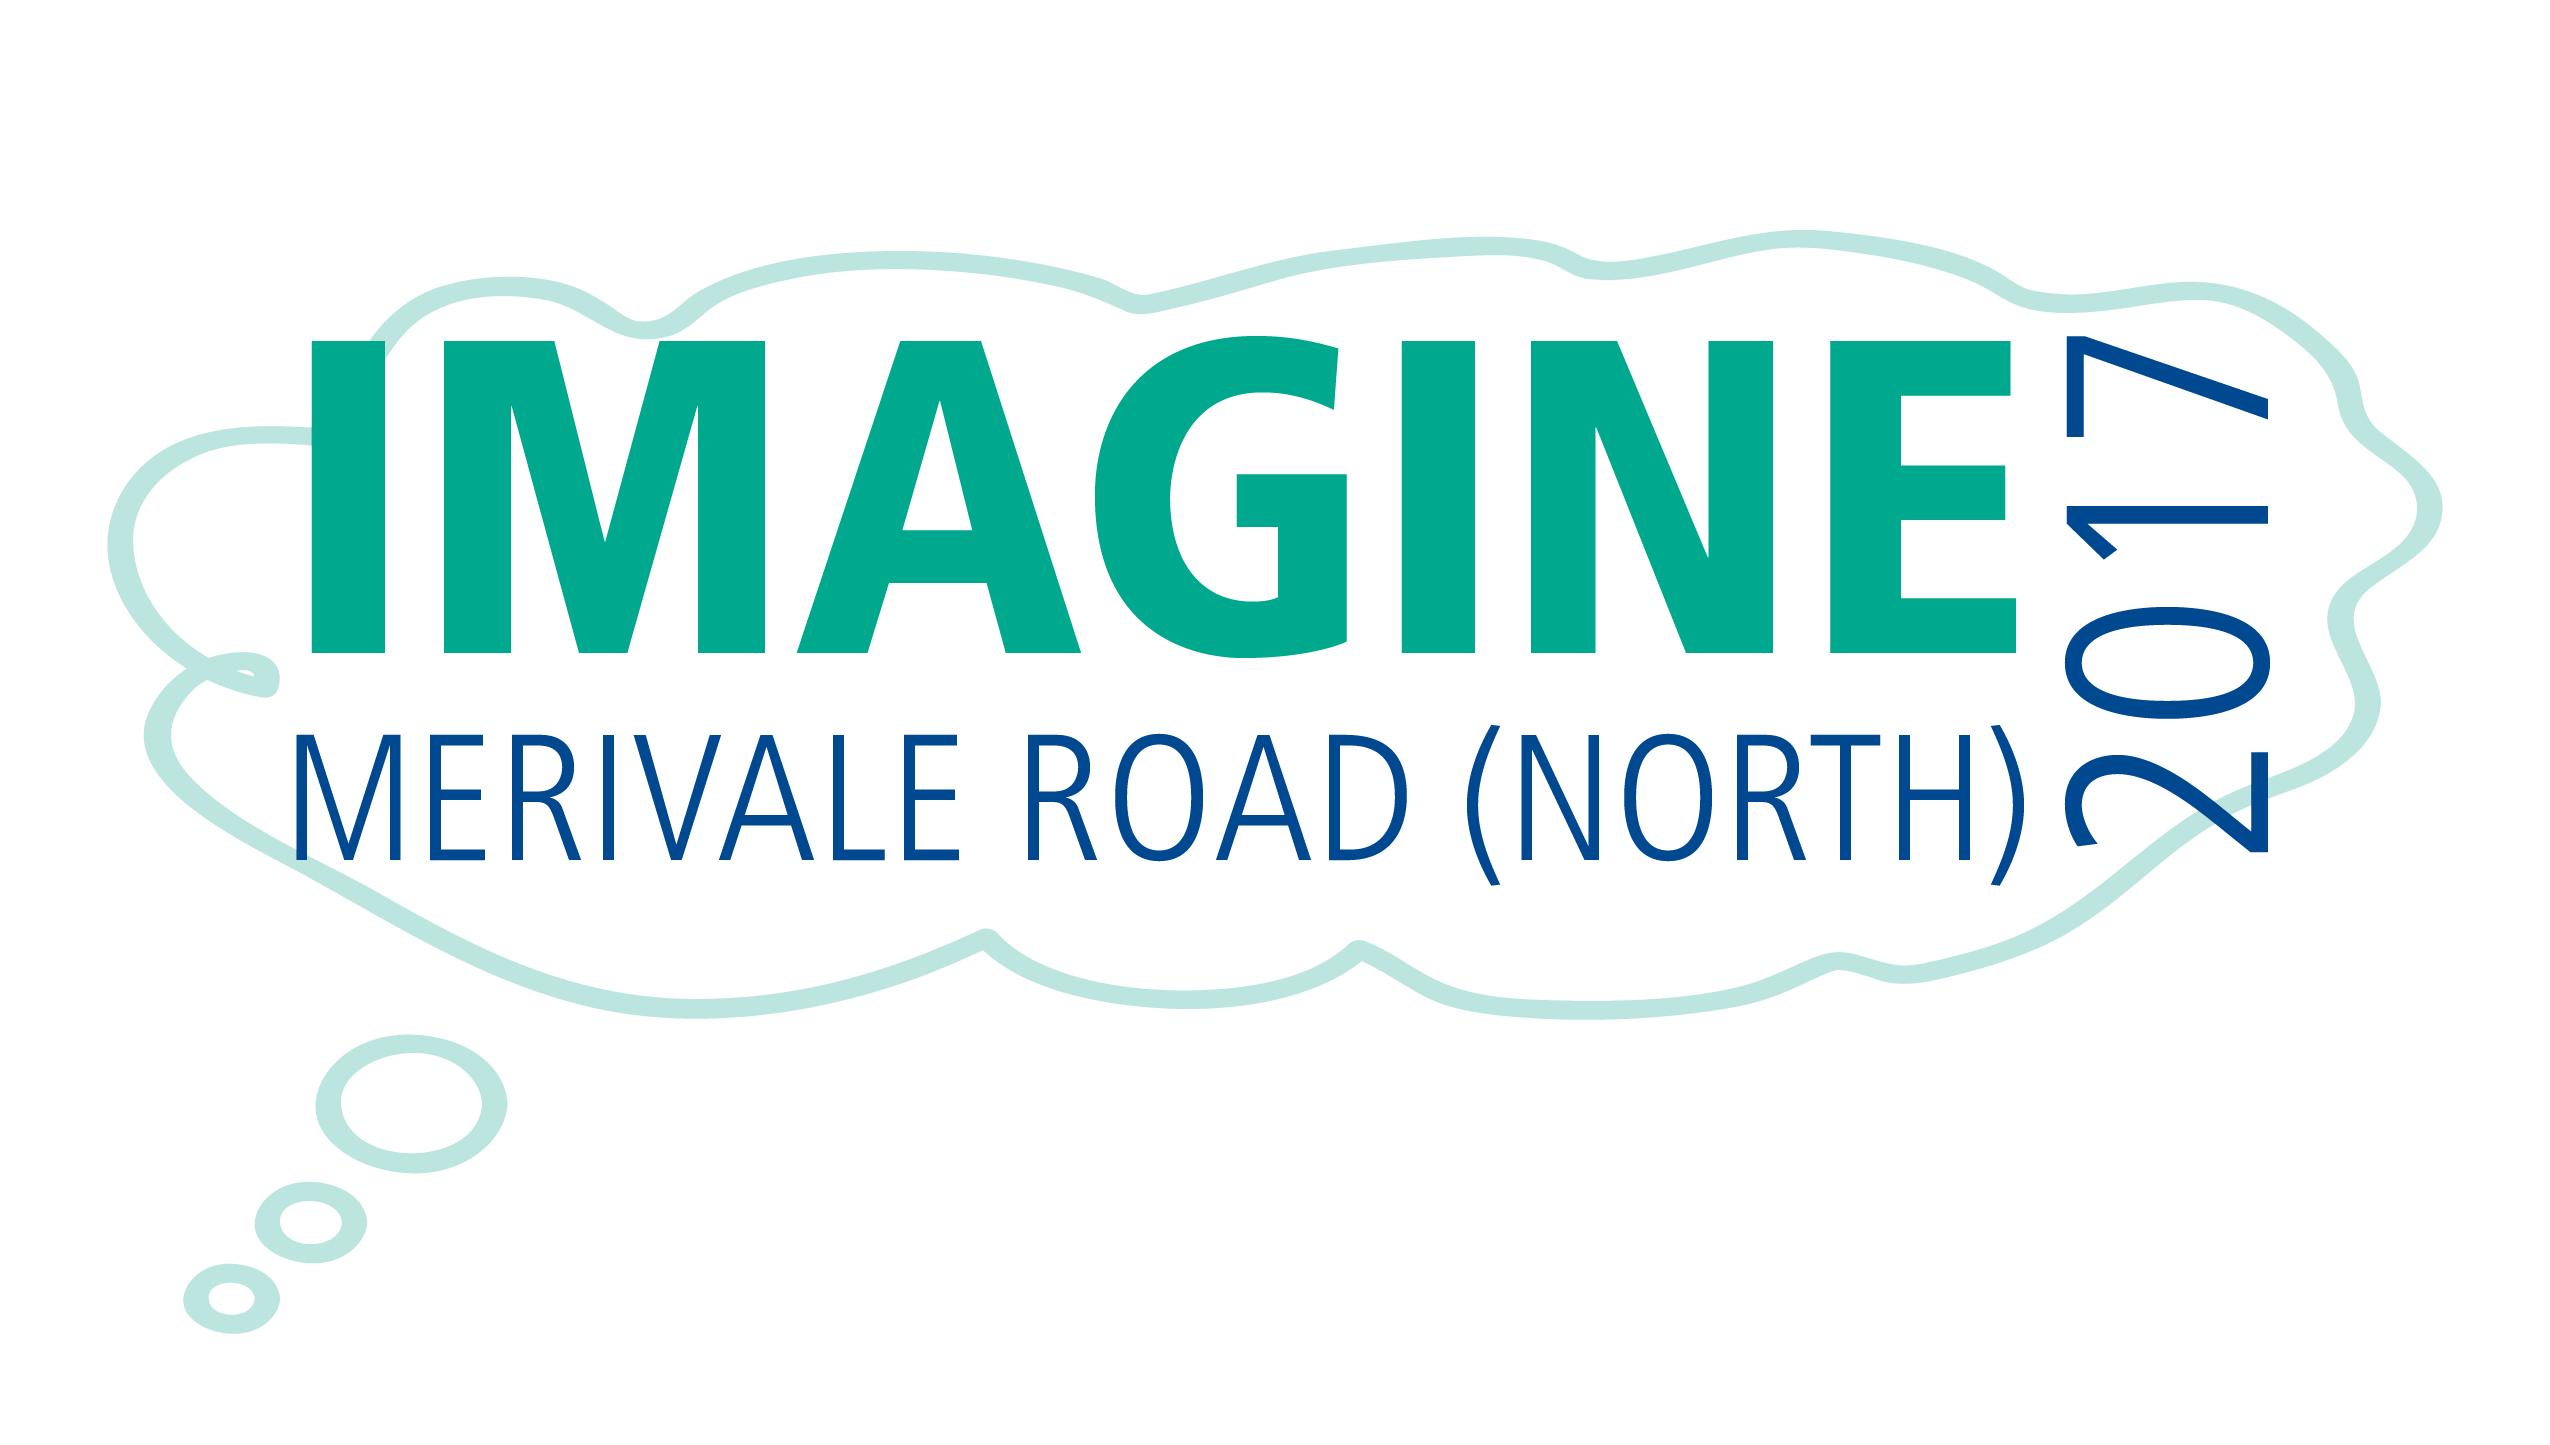 Logo of imagine merivale road north